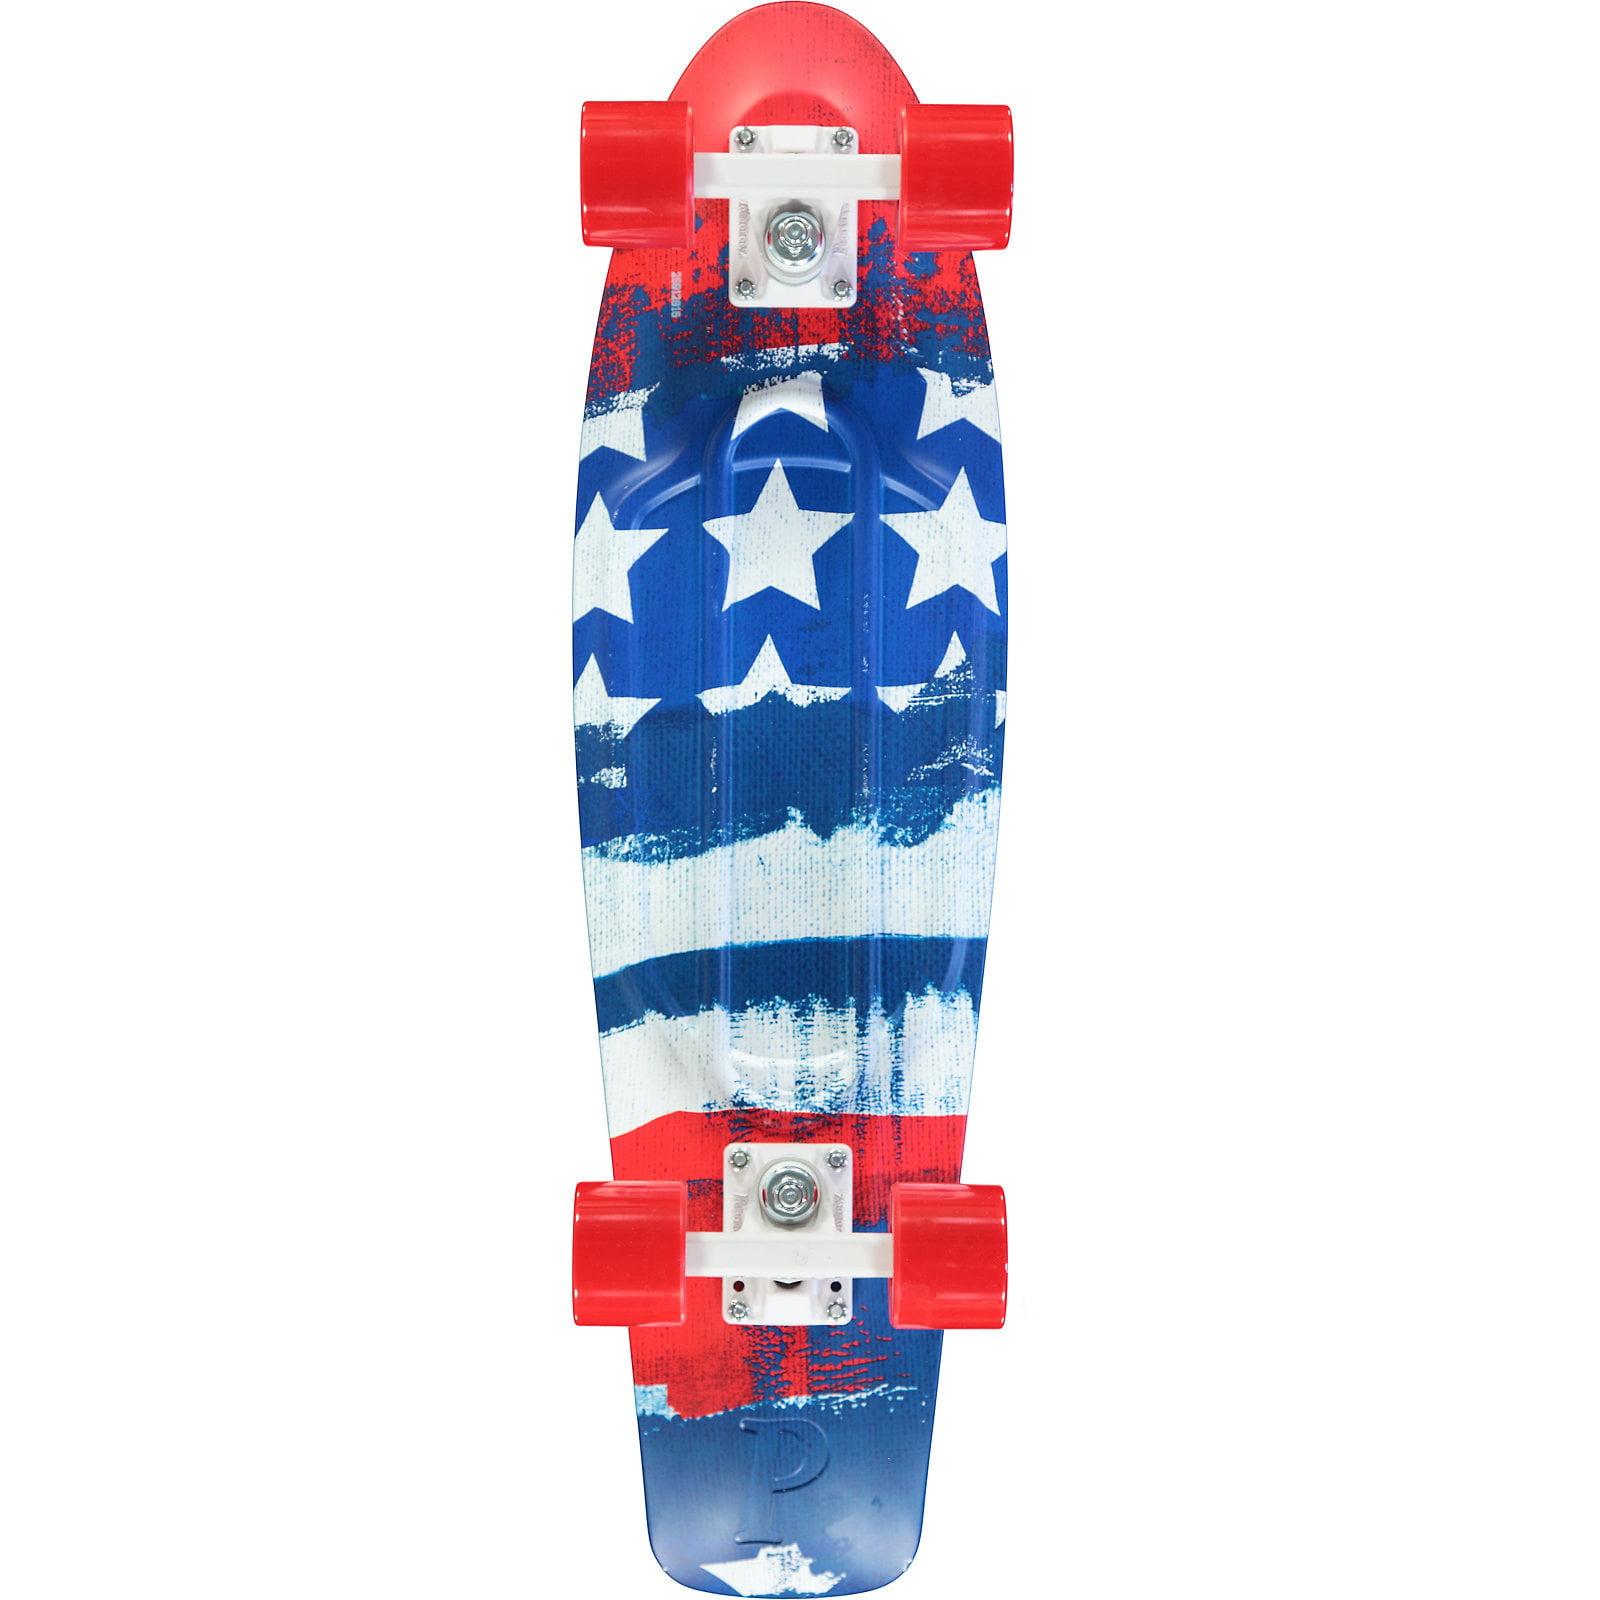 "PENNY Skateboards Patriot 27"" Complete Cruiser Skateboard..."